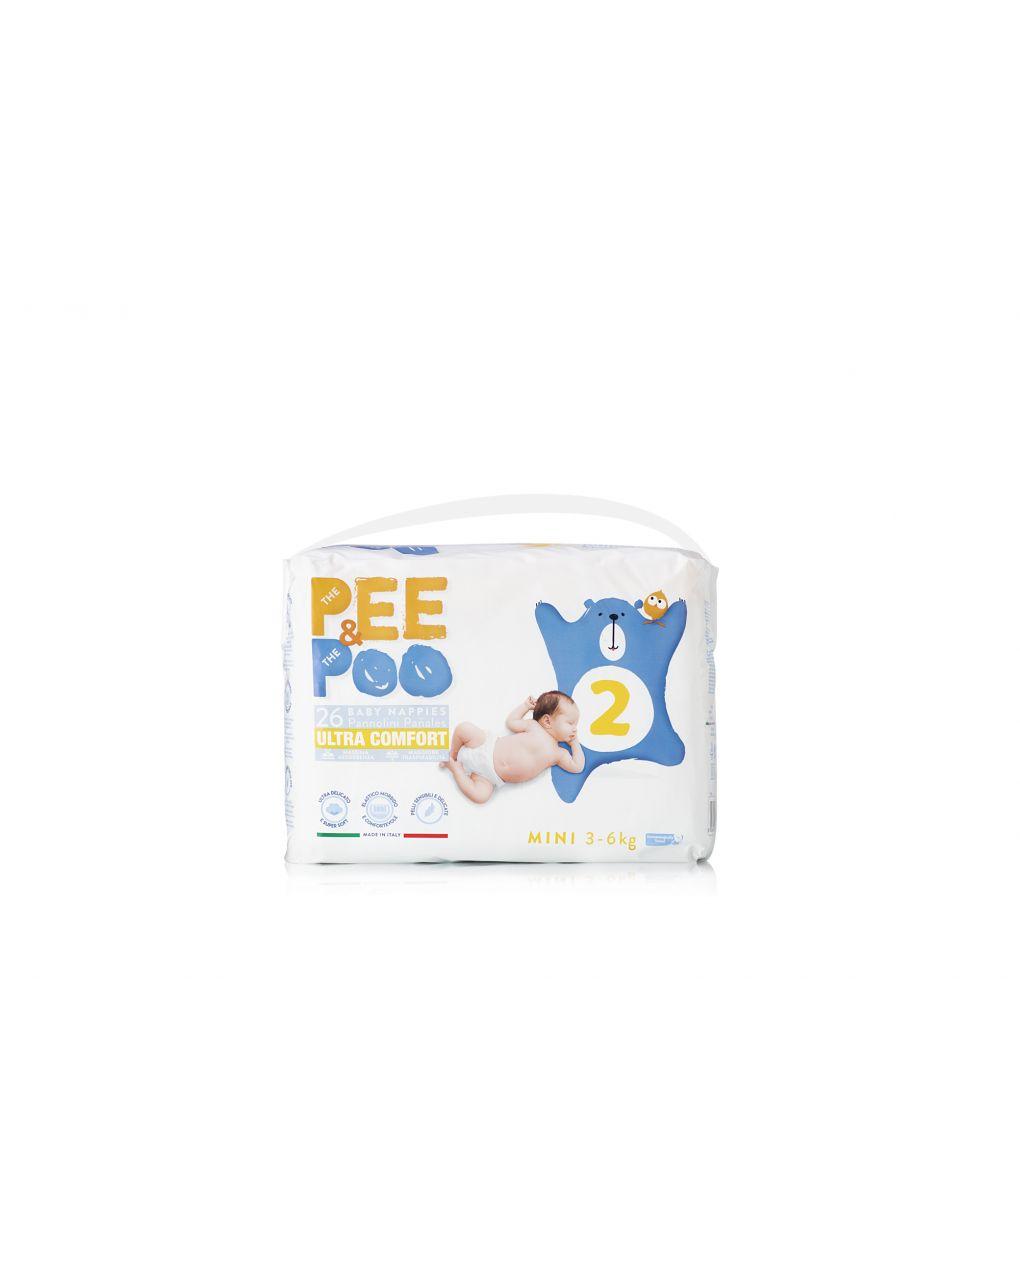 Pee&poo - mini tg 2 26 pz - The Pee & The Poo